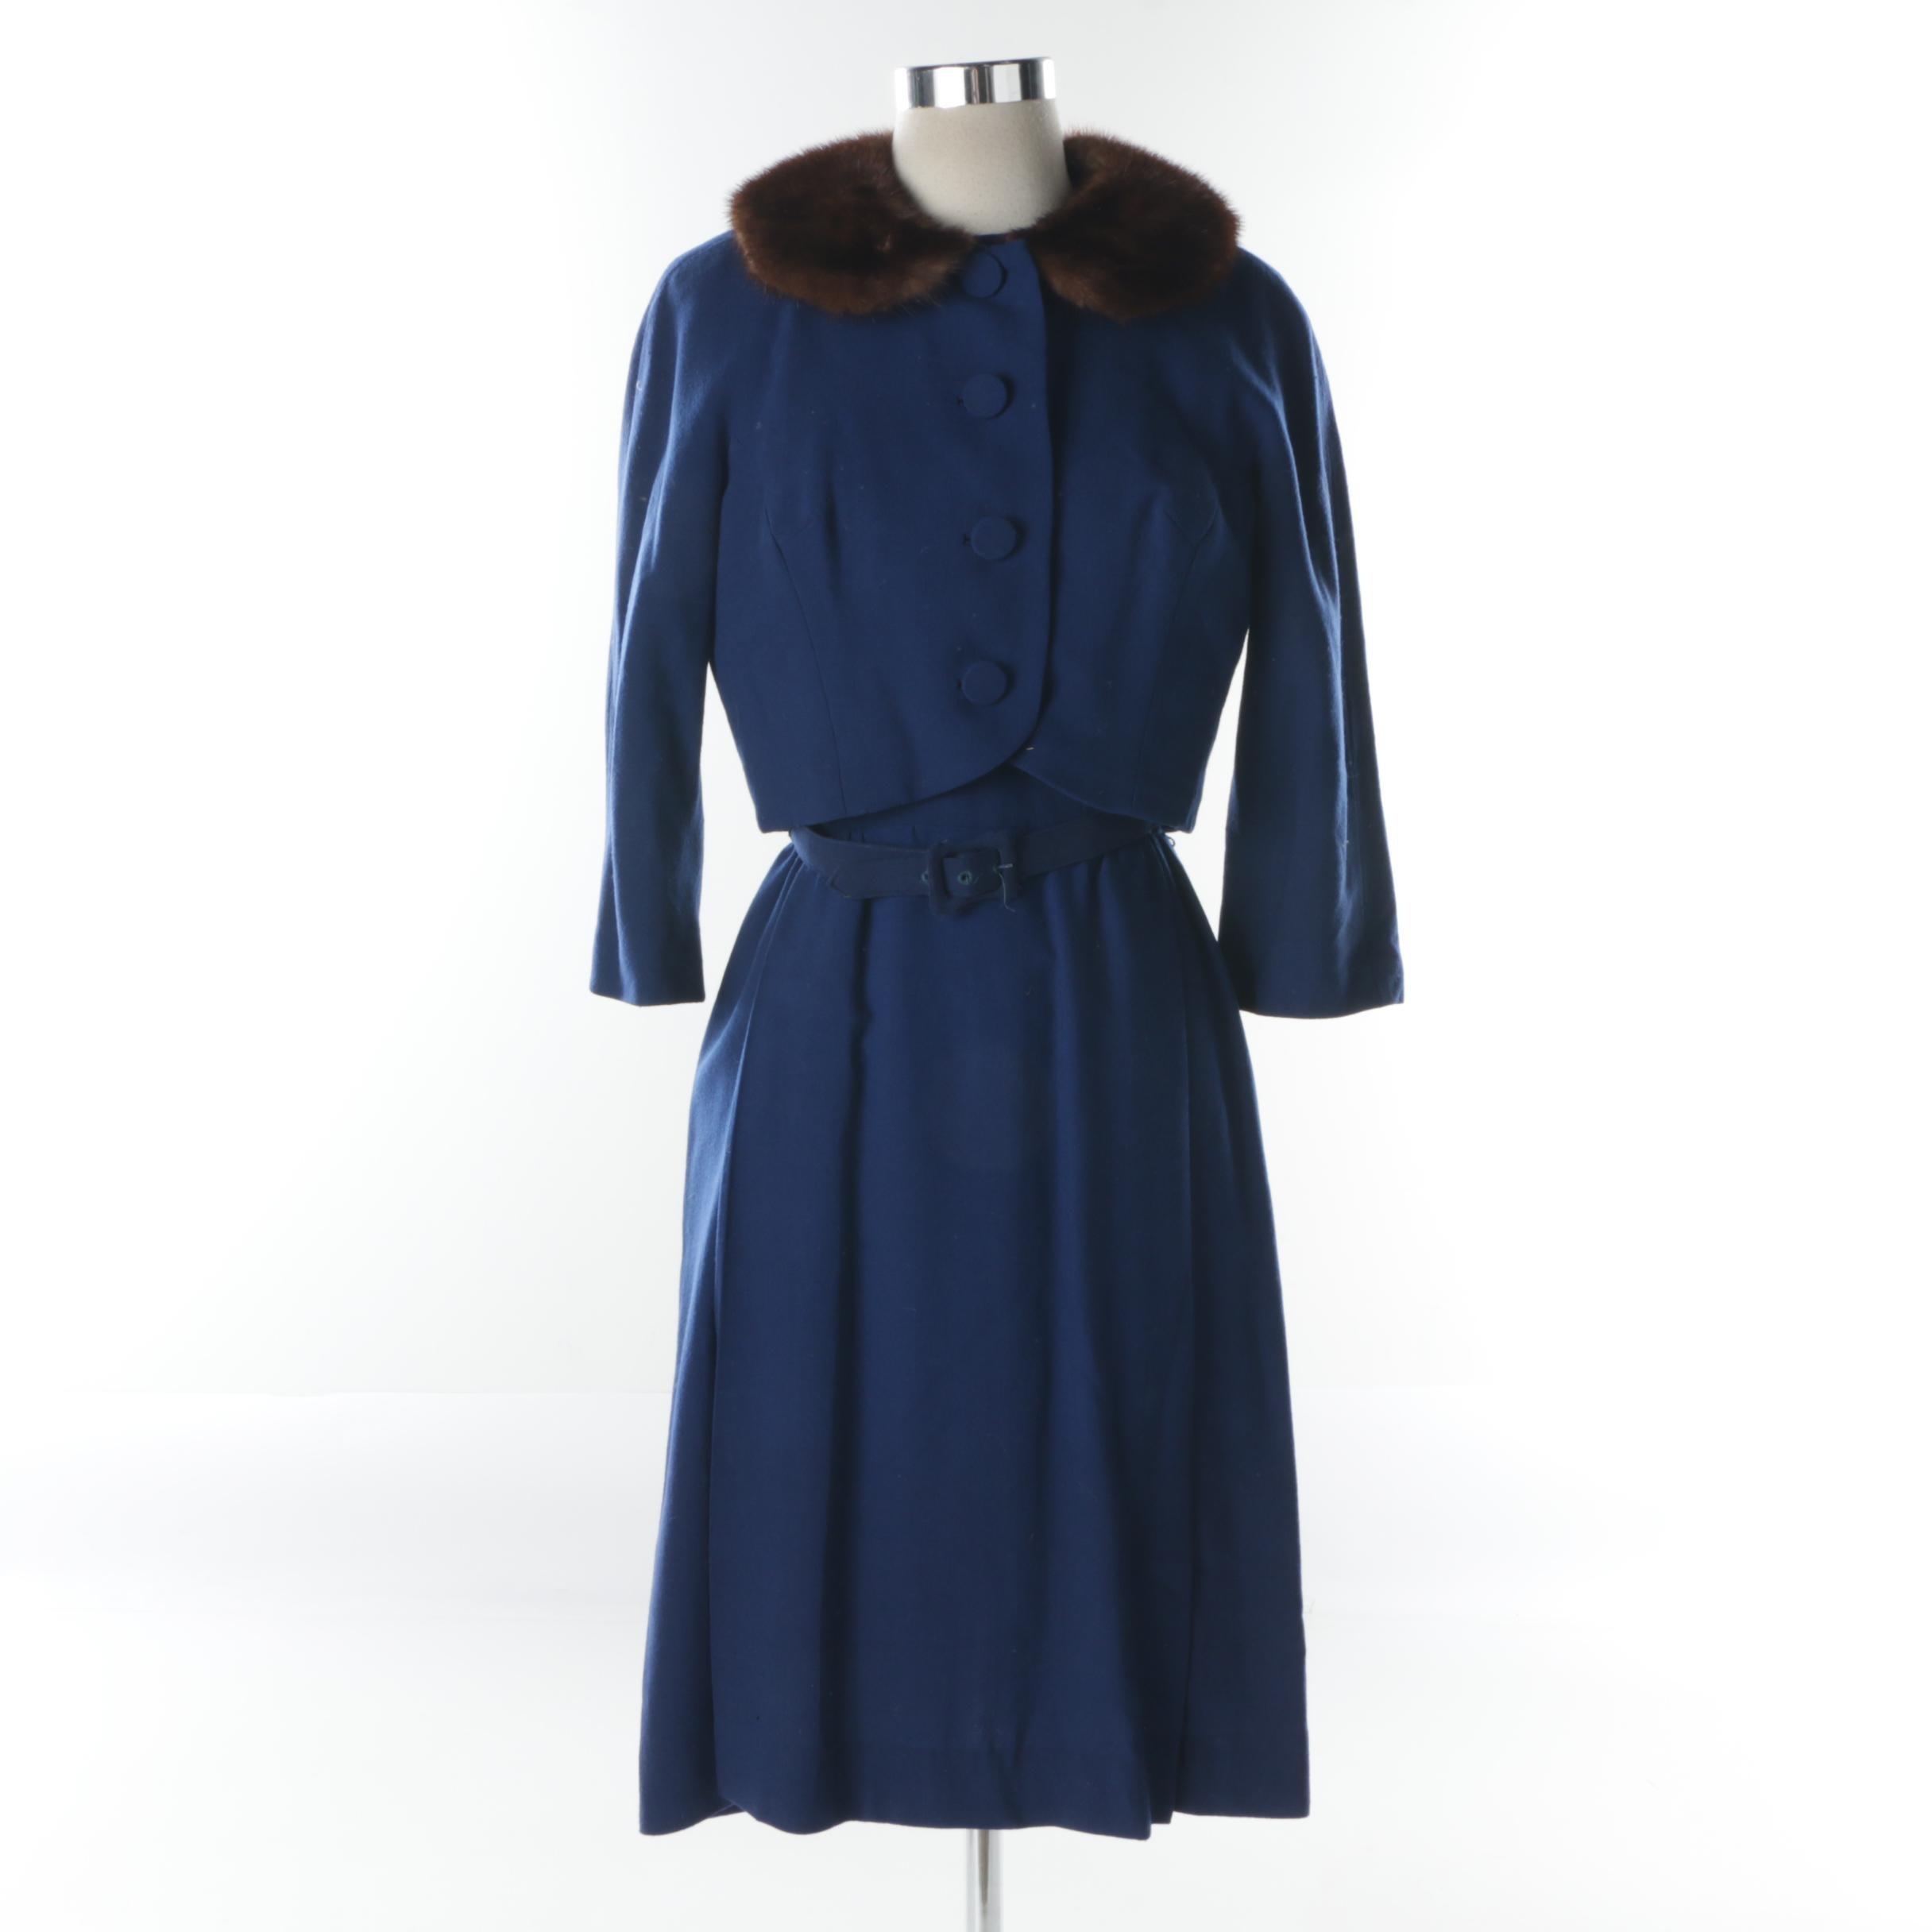 Women's Vintage Abe Schrader Blue Dress and Matching Jacket with Mink Fur Collar